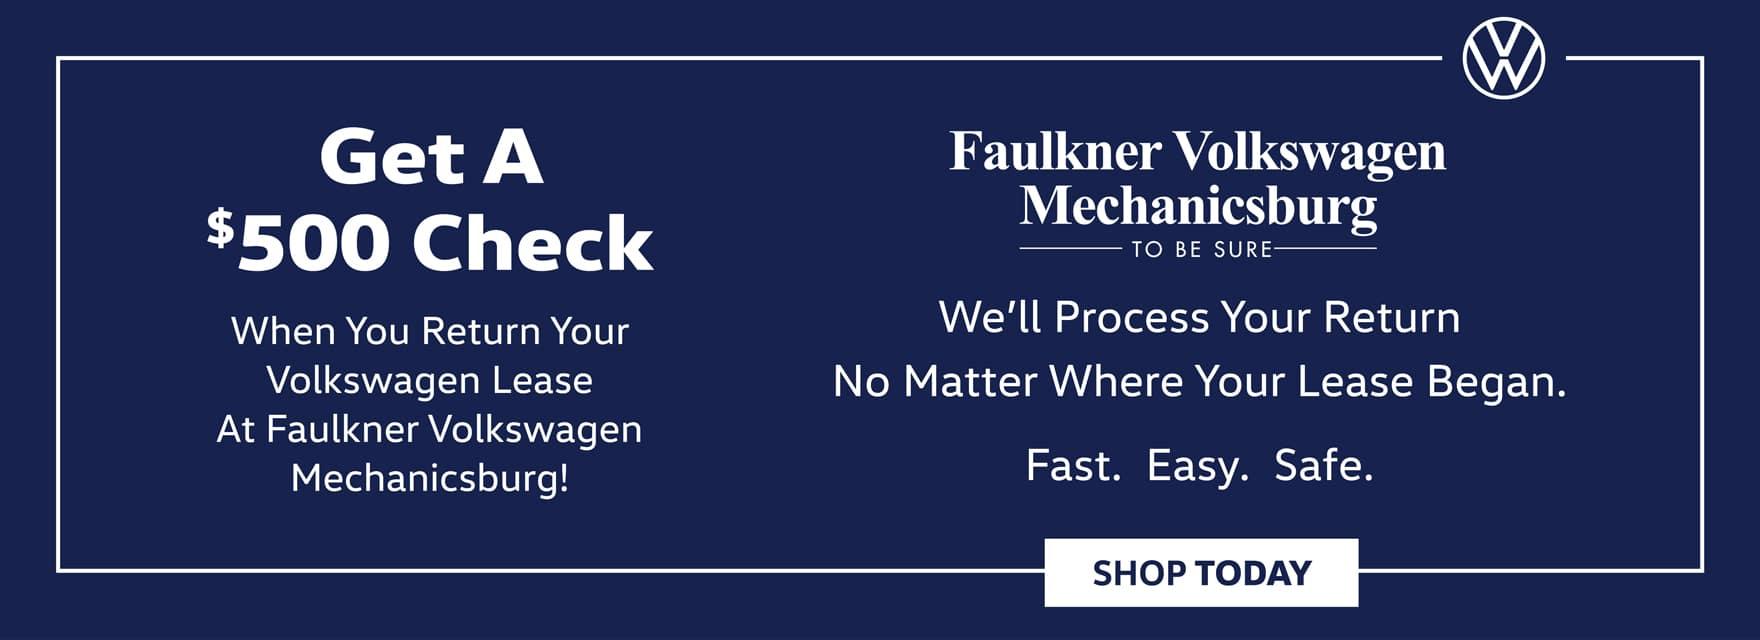 FKHV_Homepage_051721_Lease